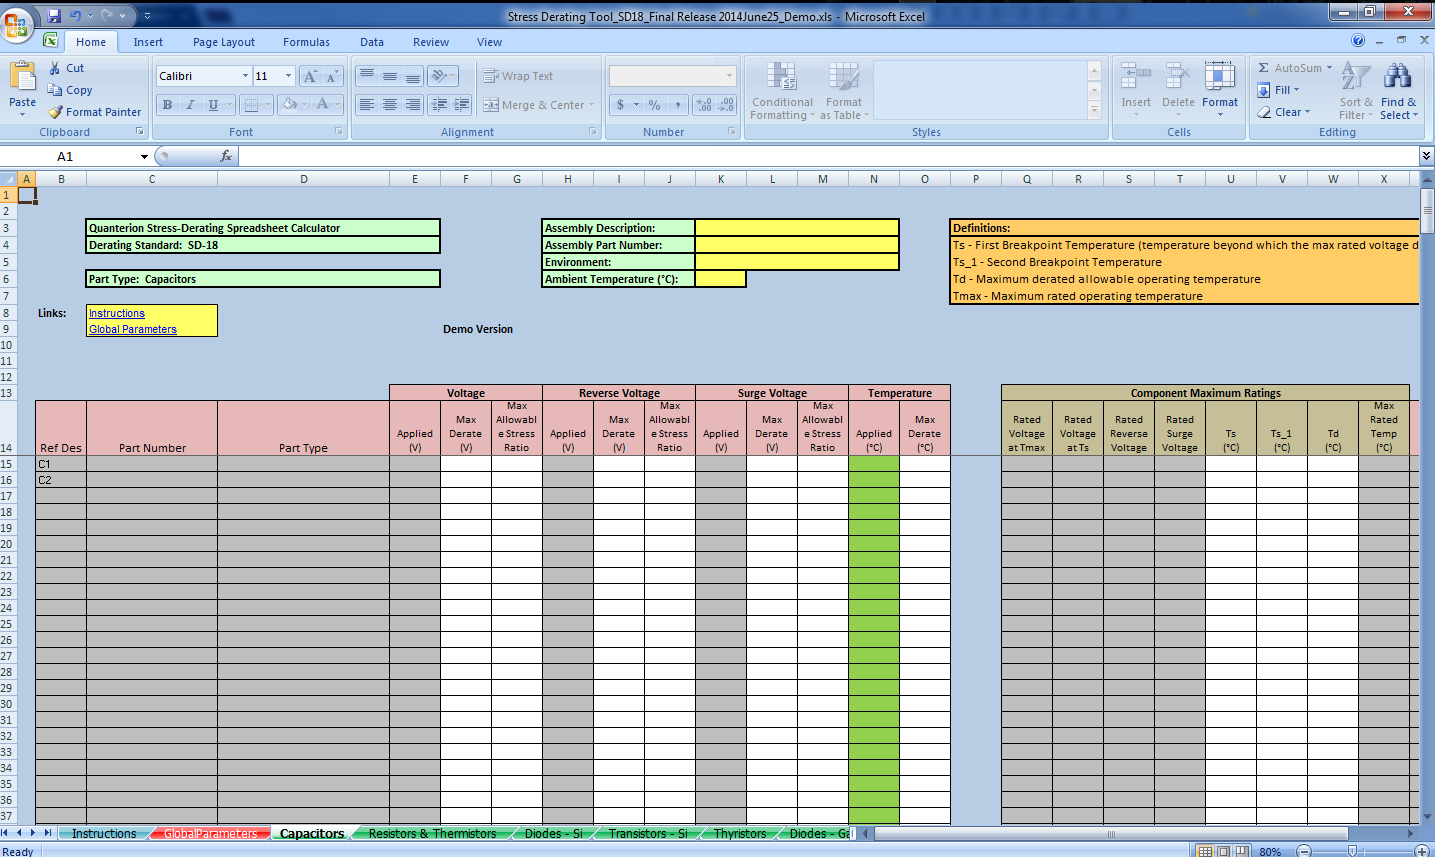 Availability Calculator Spreadsheet With Stressderating